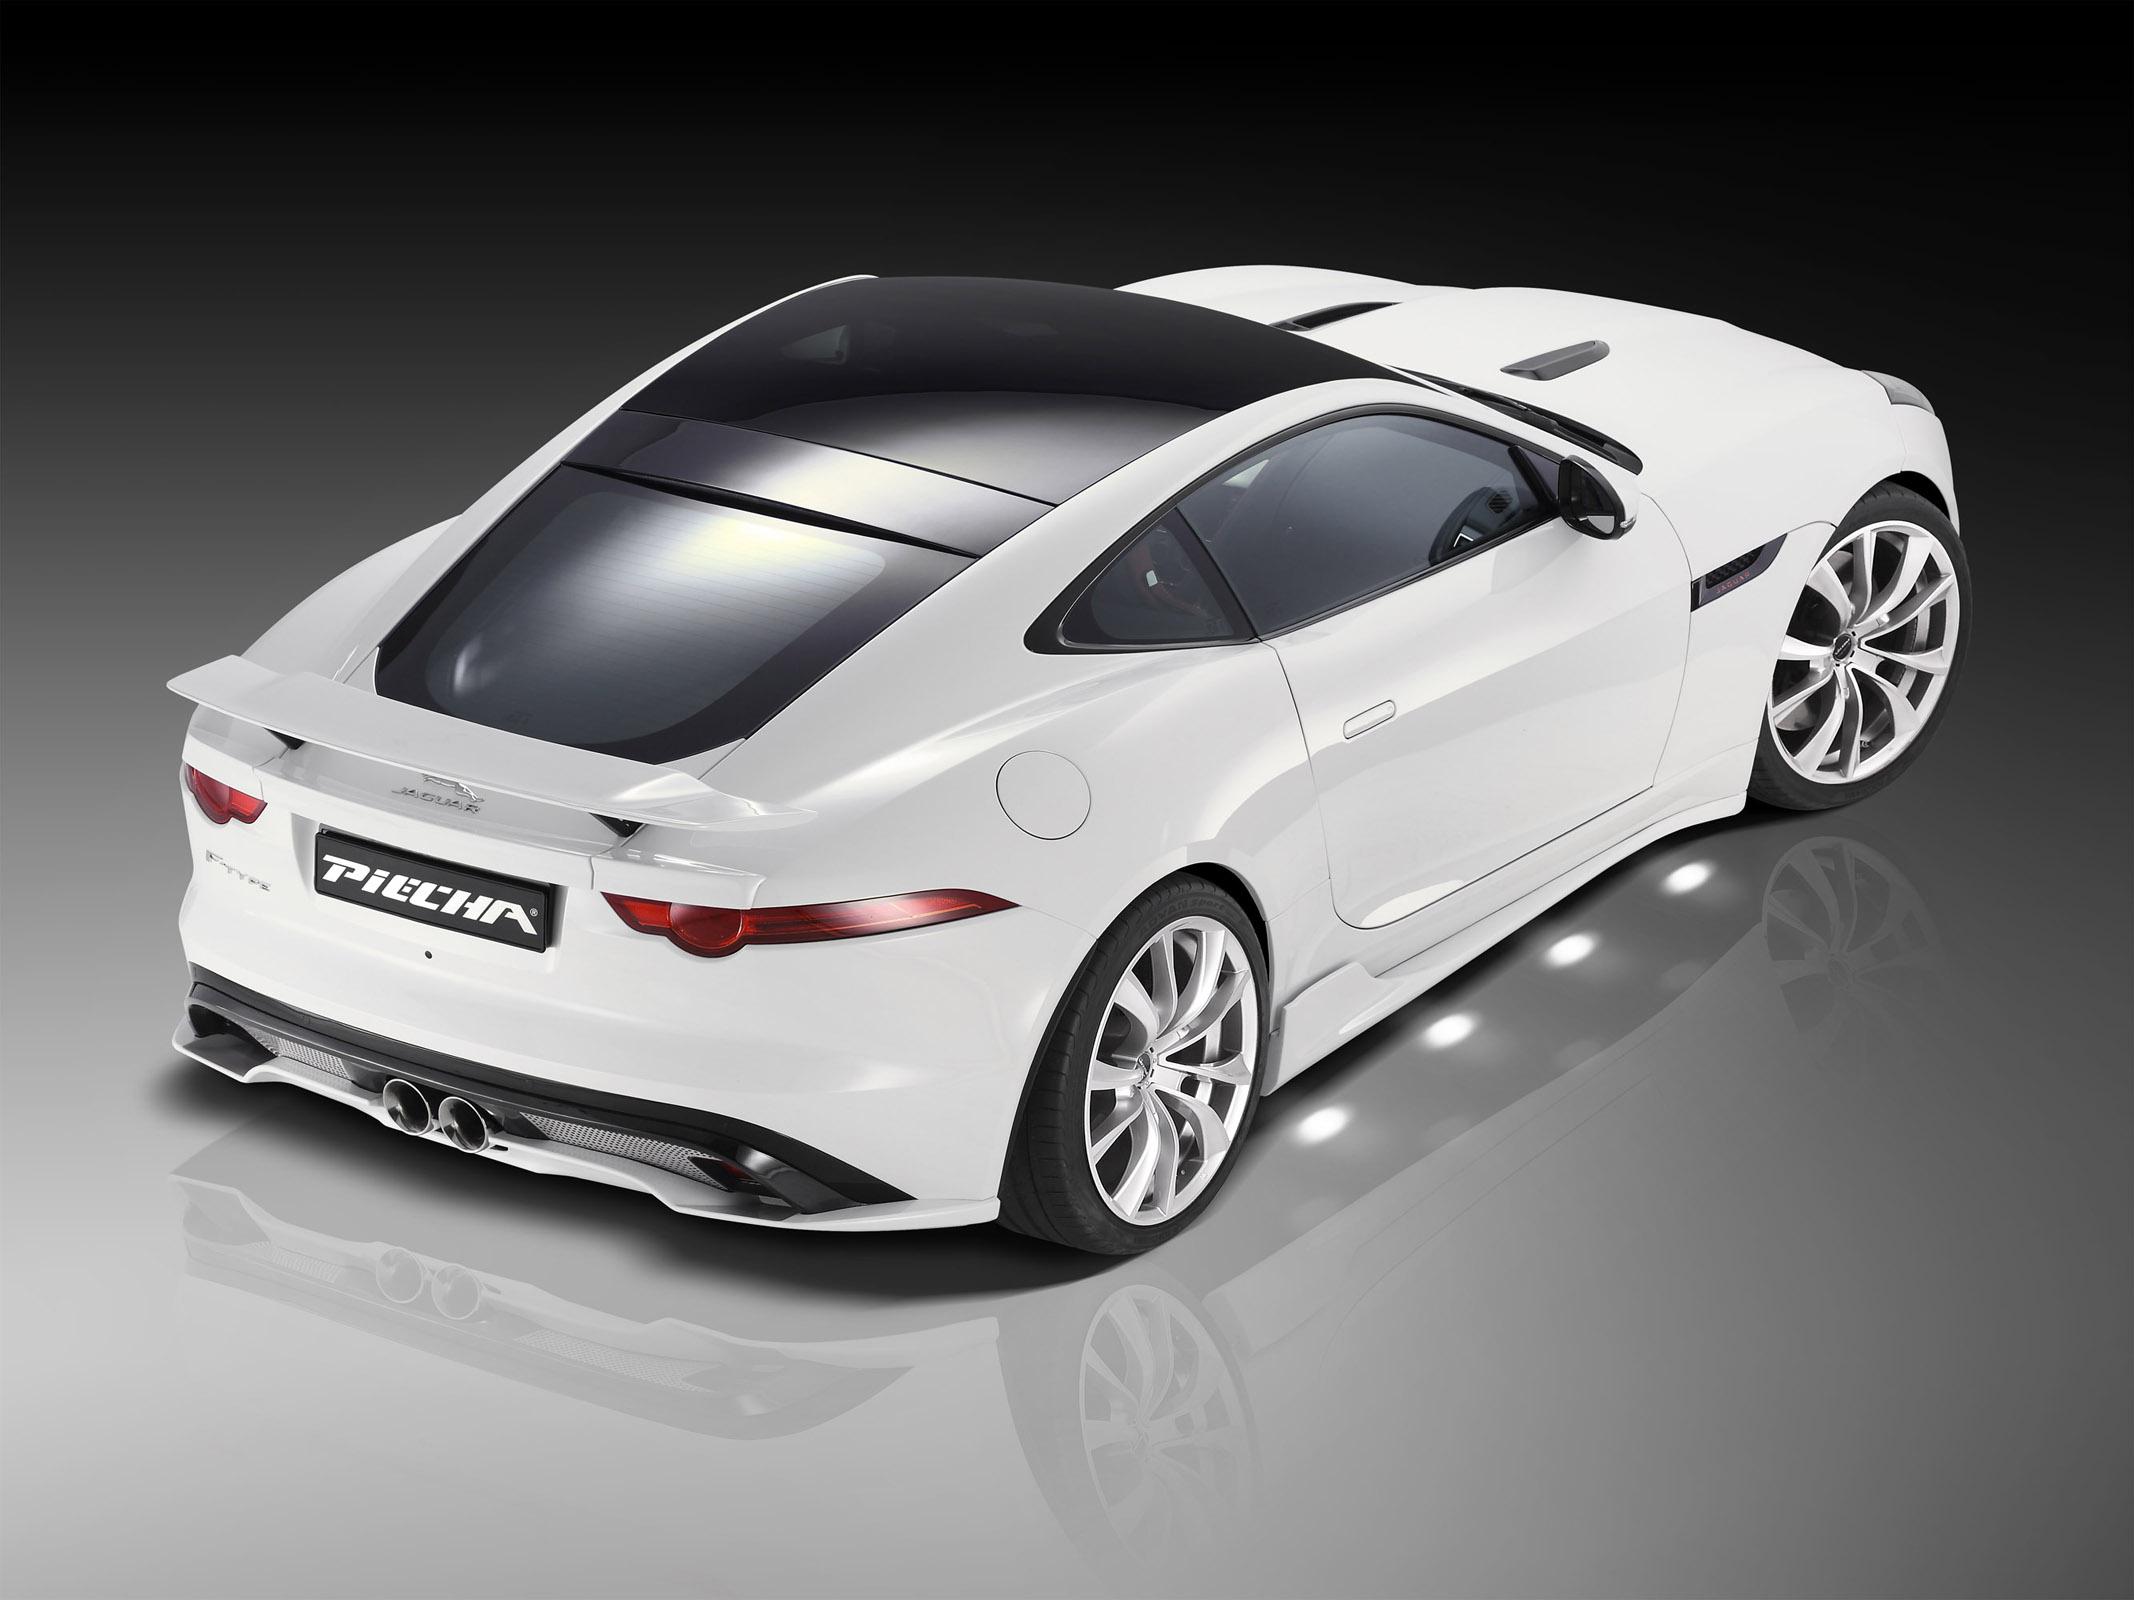 2015 Piecha Design Jaguar F-Type V6 Coupe